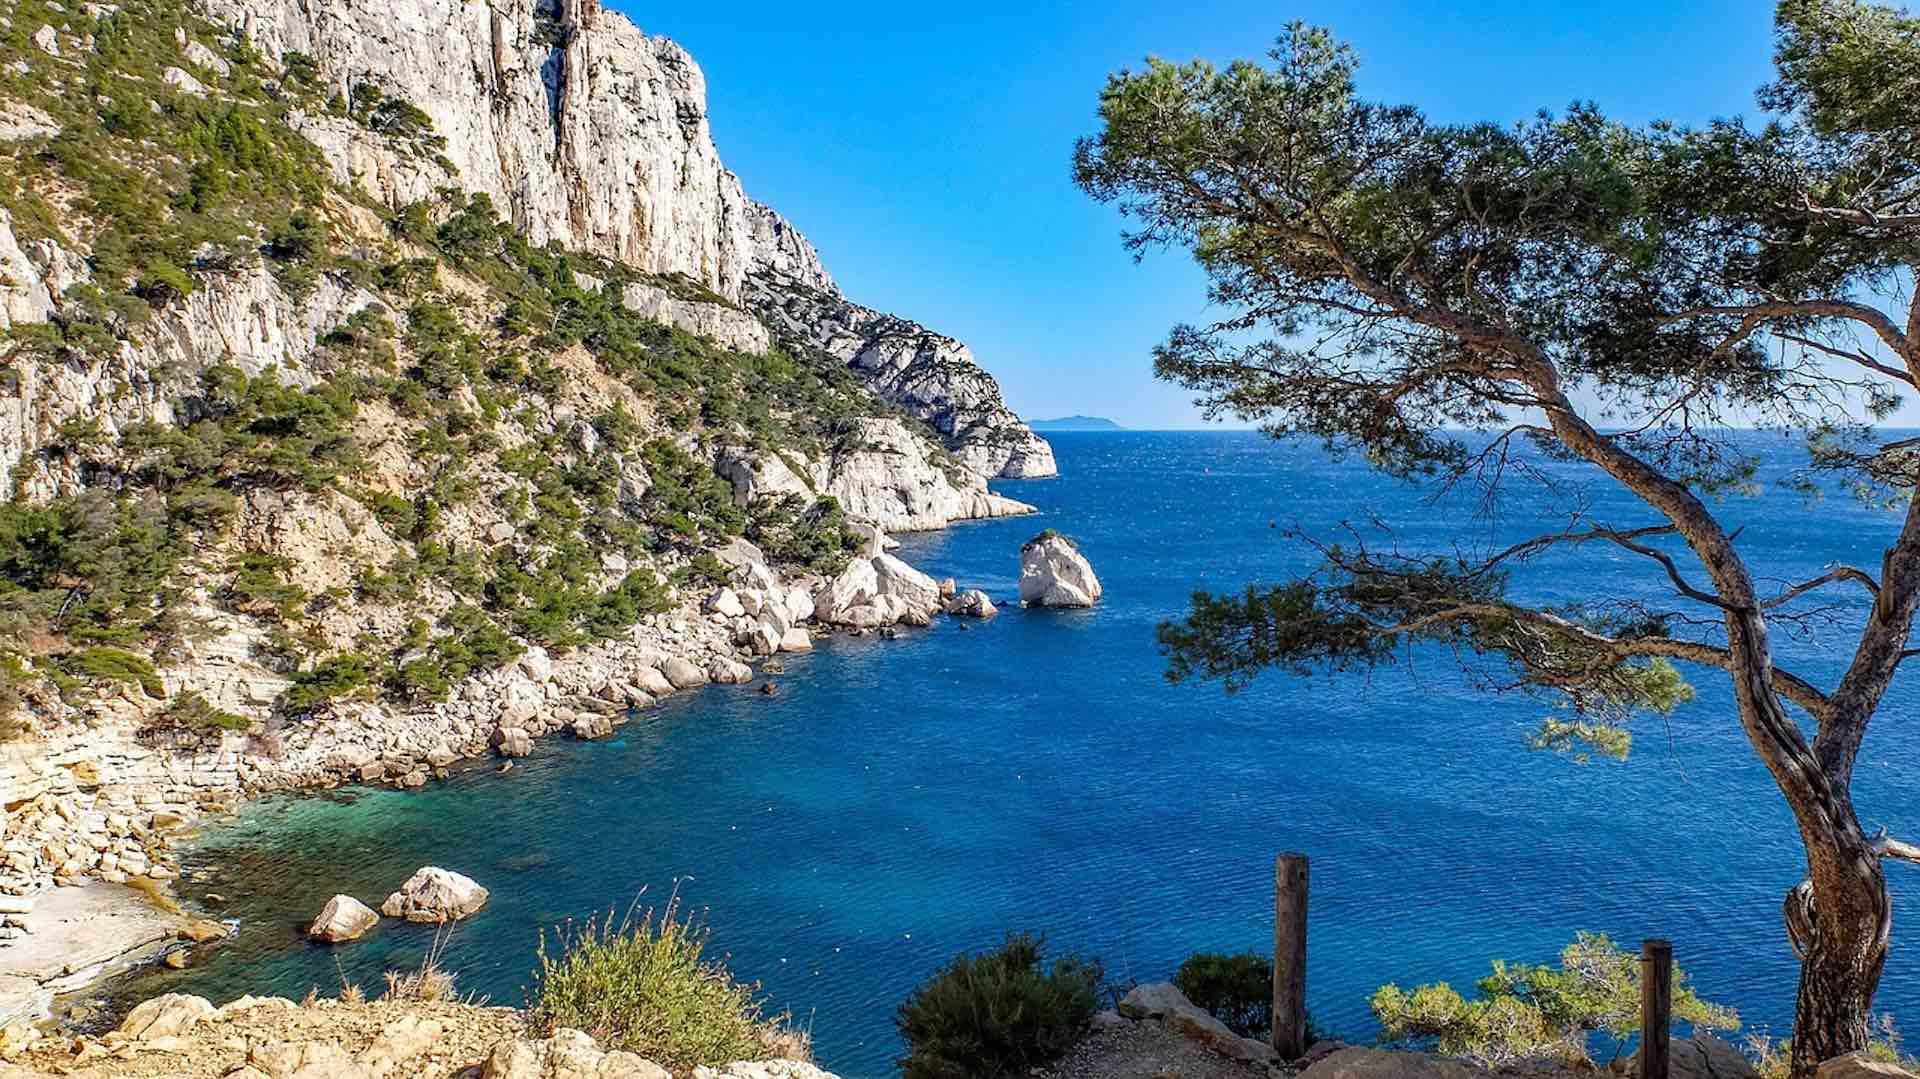 Les calanques de marsella a cassis la provenza y costa - Hoteles en la provenza ...